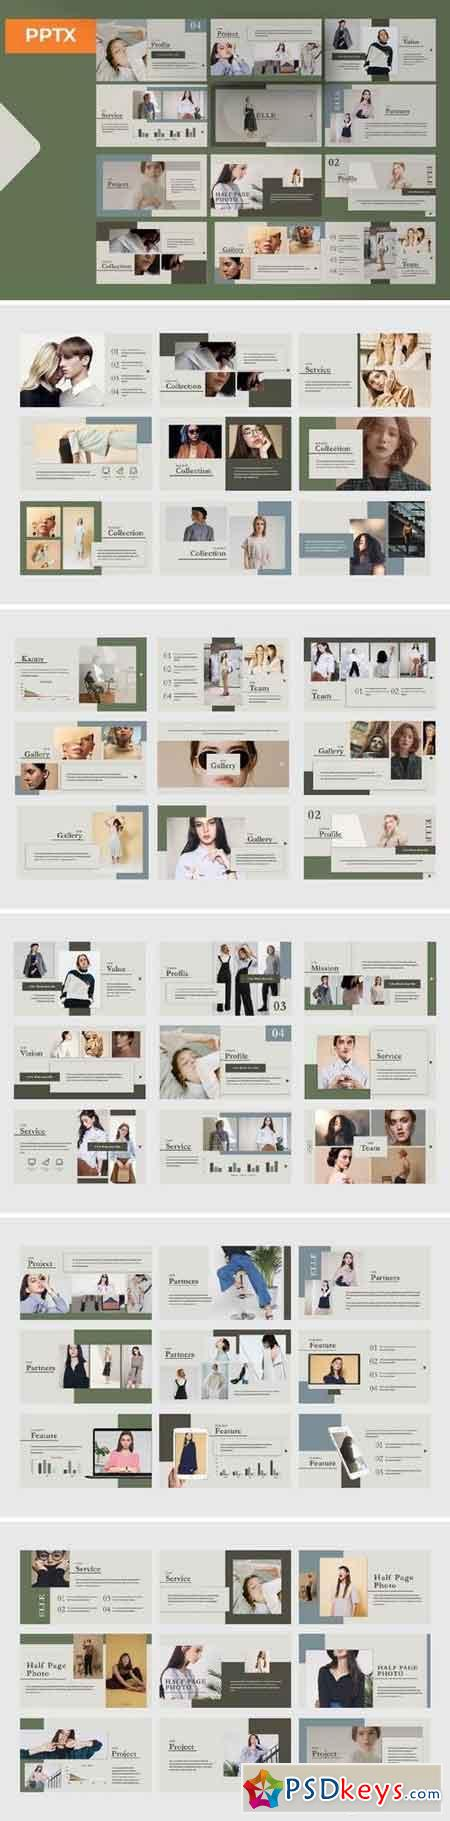 Elle Presentation - Powerpoint, Keynote, Google Sliders Templates